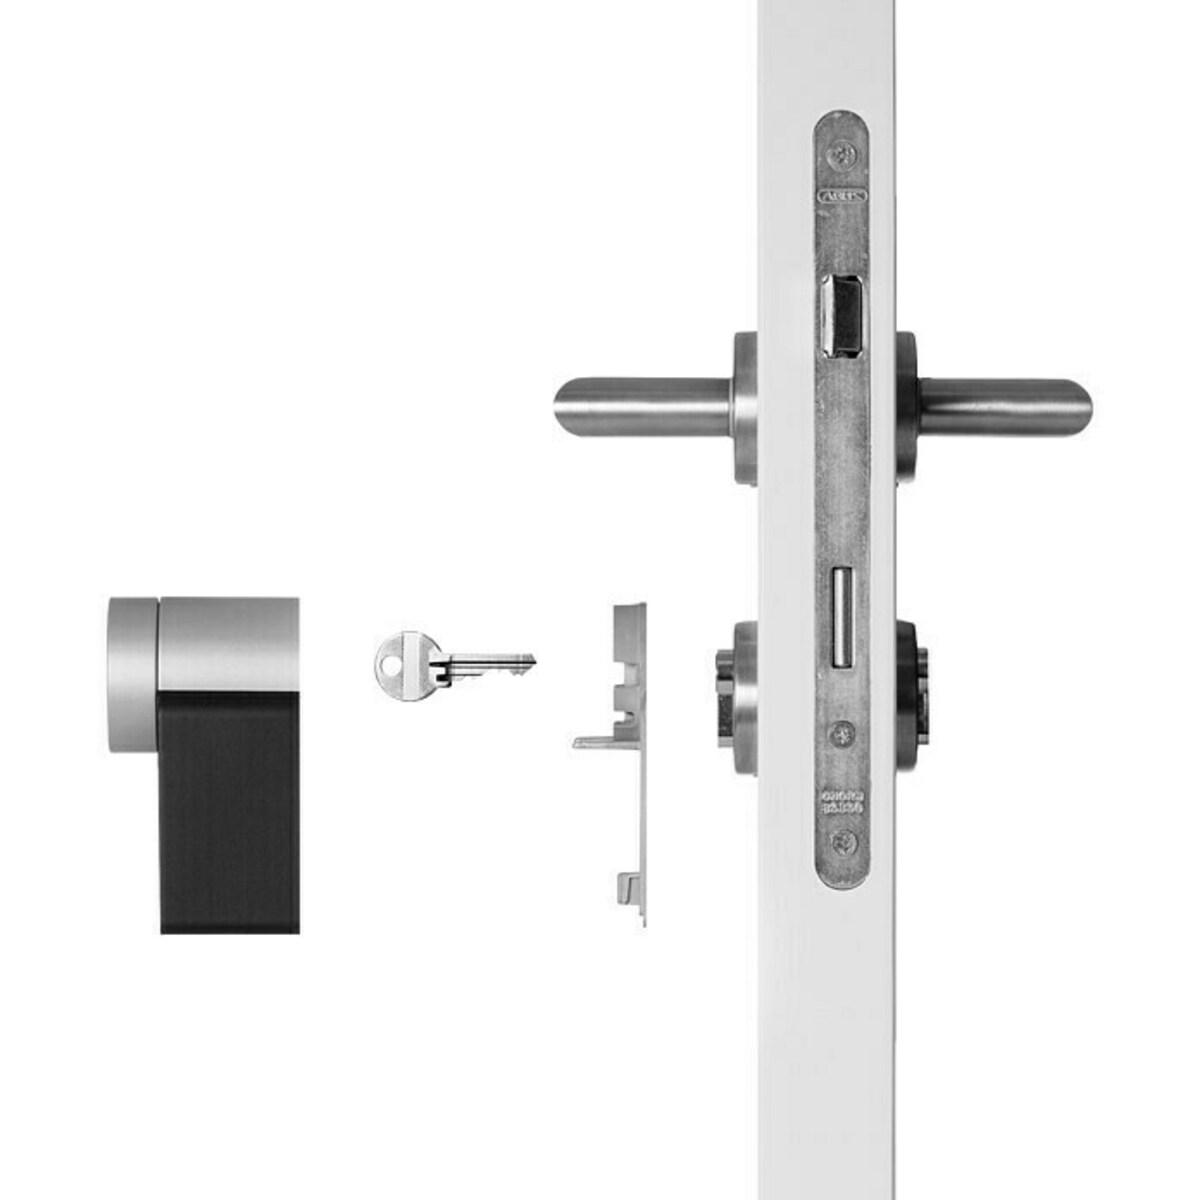 Bild 5 von Nuki Elektronisches Türschloss-Set Smart Lock Combo 2.0